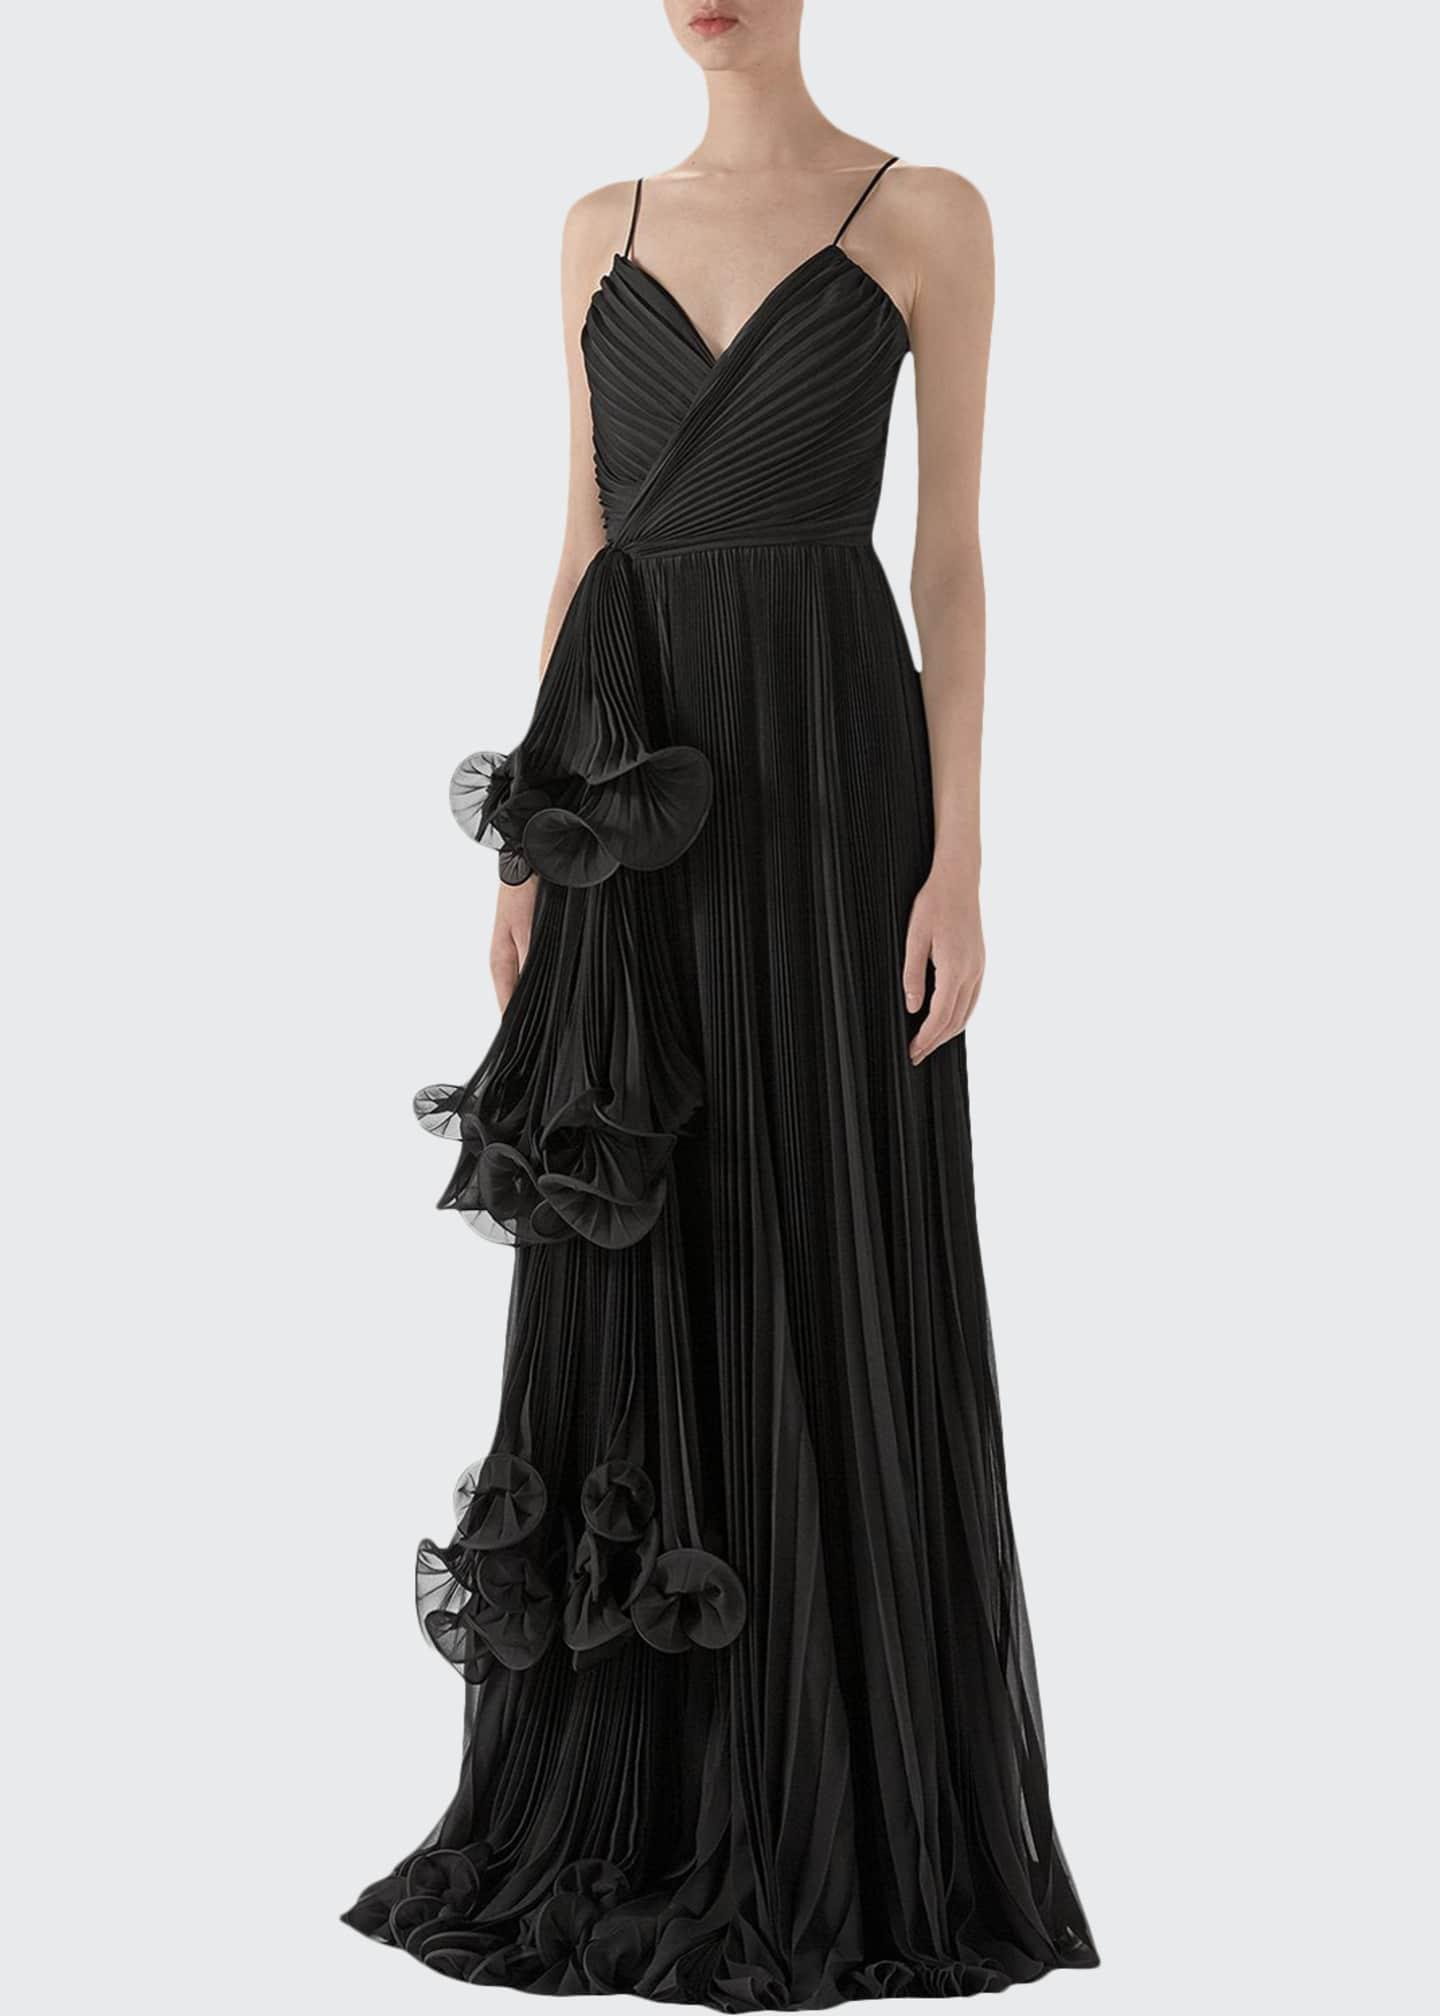 Gucci Light Silk Georgette Plisse Gown